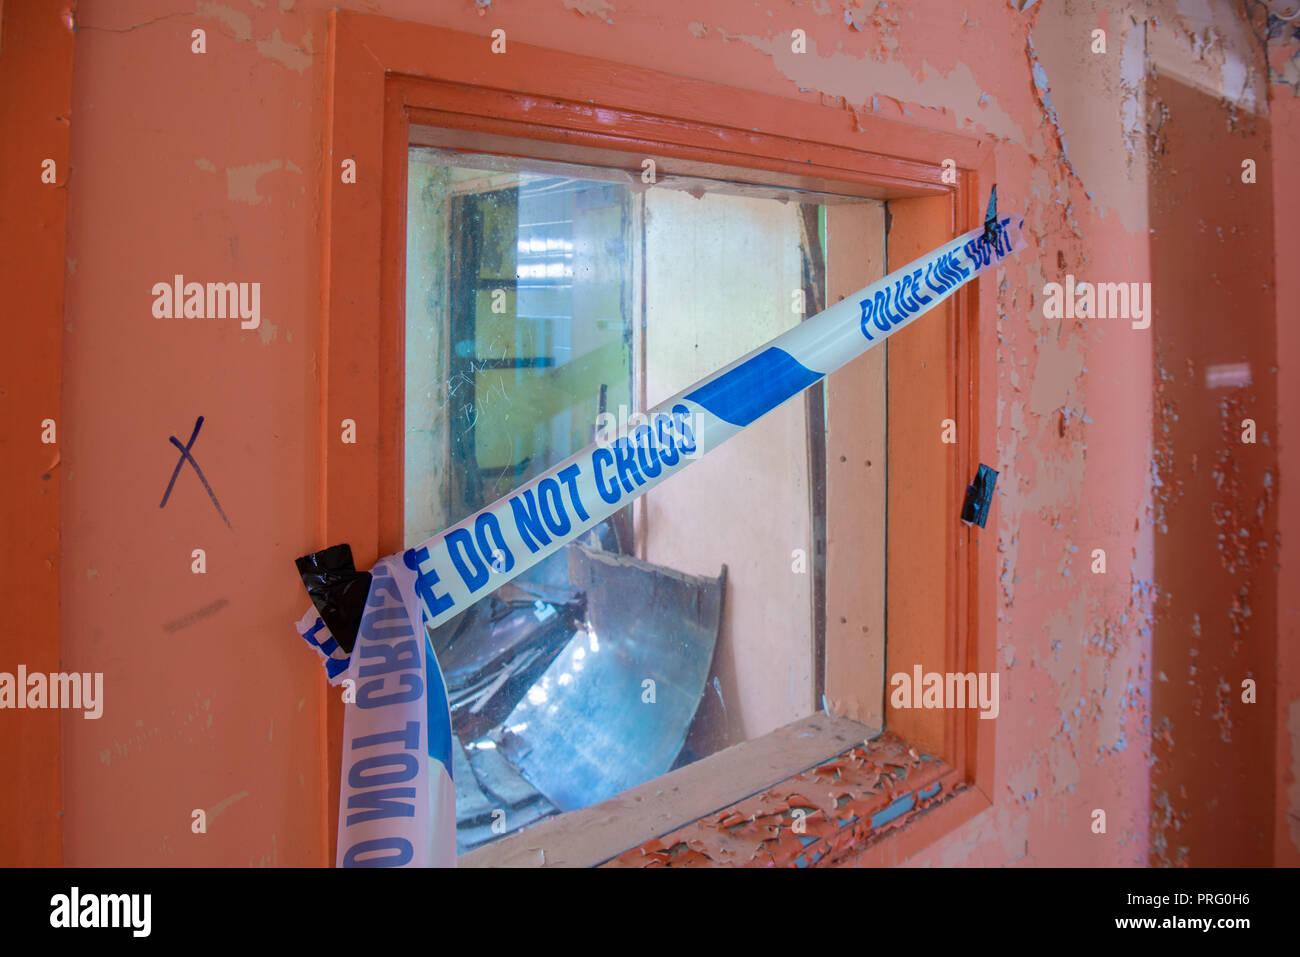 Cerco policial a través de una ventana de cinta Imagen De Stock